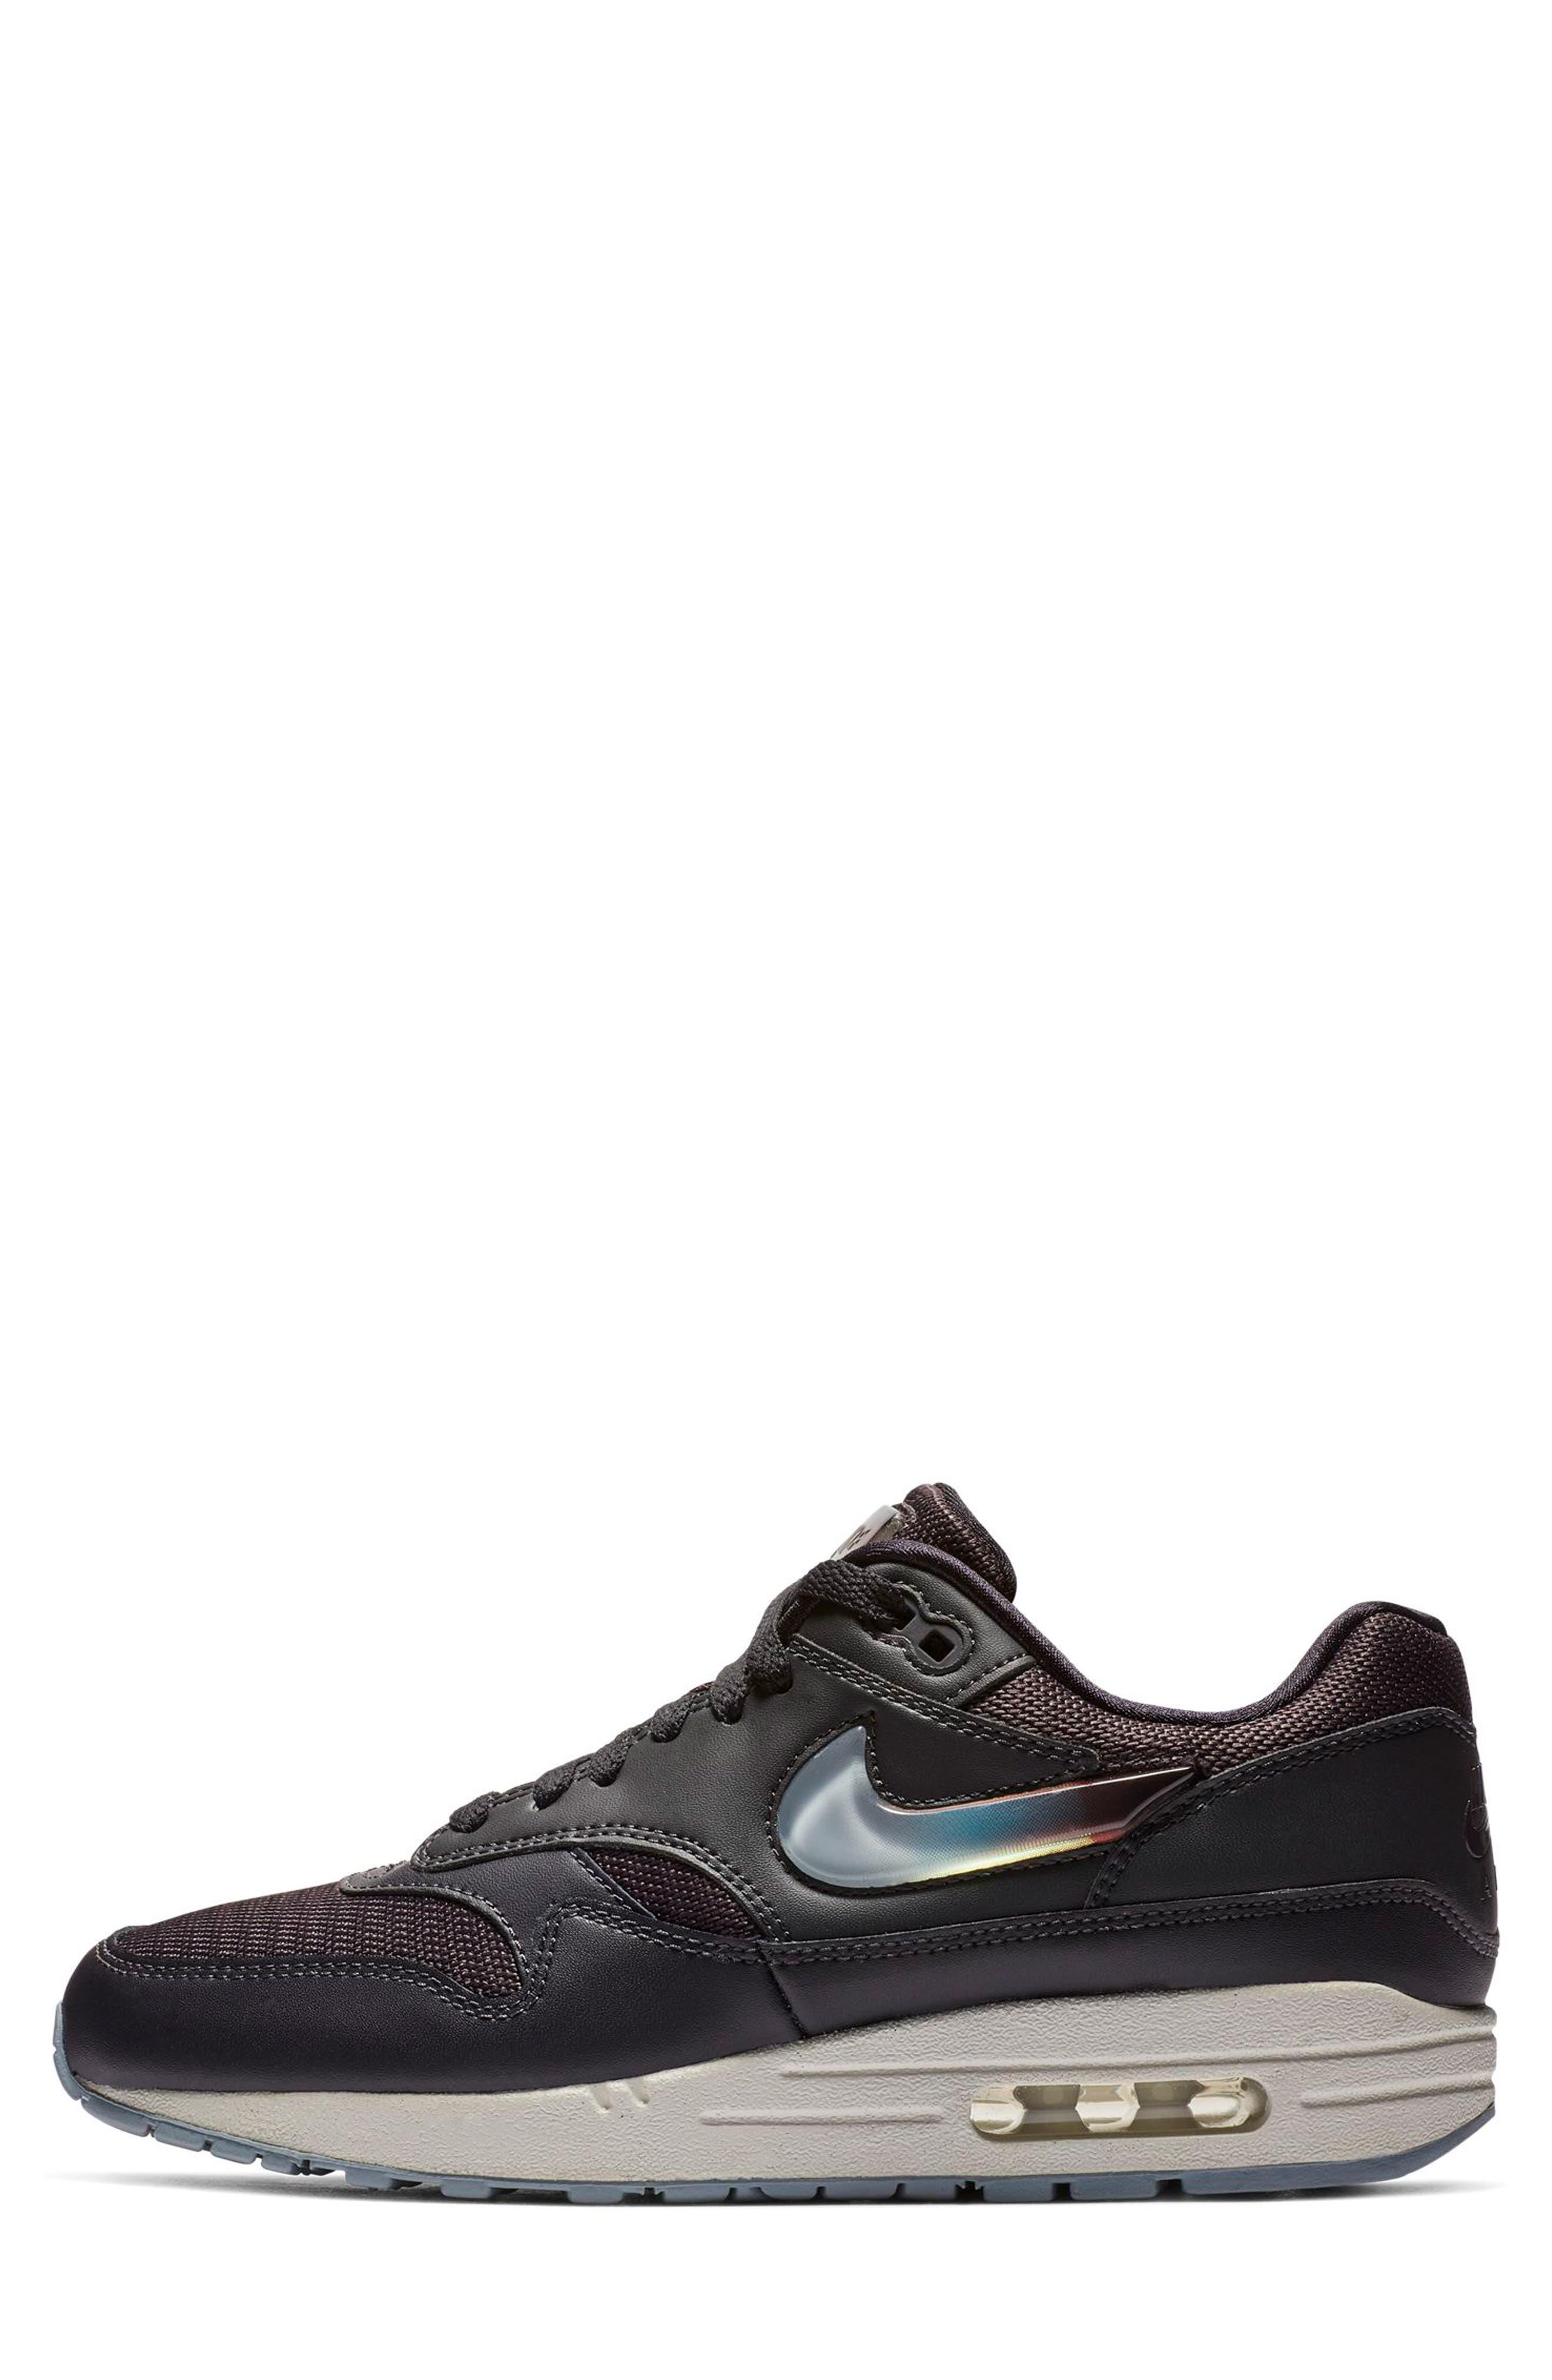 NIKE, Air Max 1 JP Sneaker, Alternate thumbnail 3, color, OIL GREY/ OBSIDIAN/ WHITE